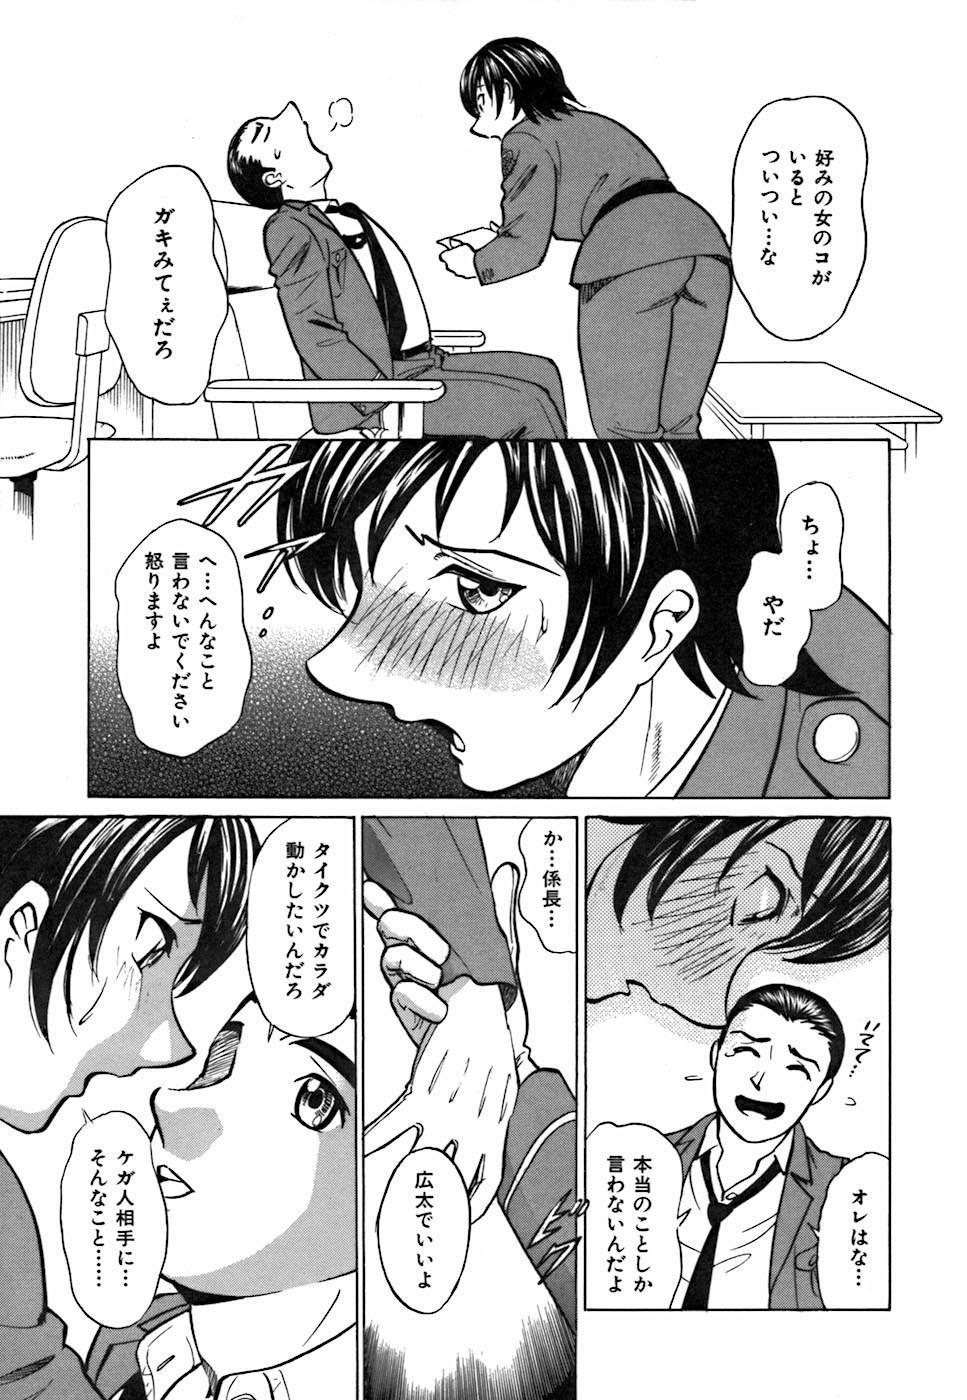 Kimi ga Nozomu Katachi | Appearance for which you hope 114